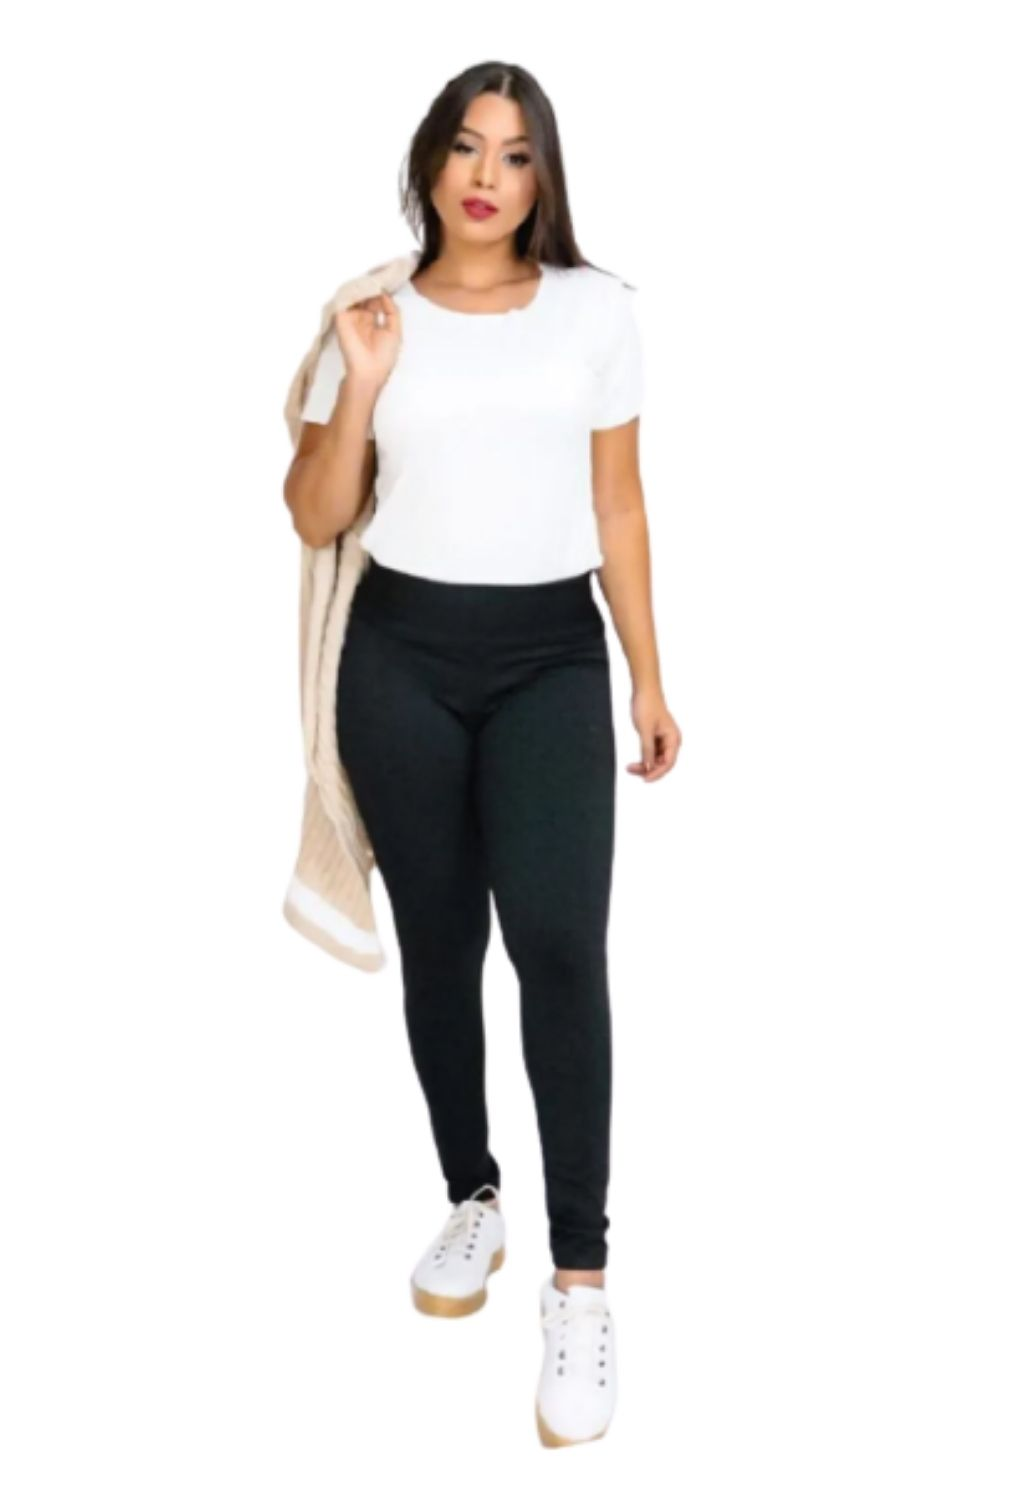 Calça Legging Feminina Básica Forrada  - ModaStore   Moda Feminina